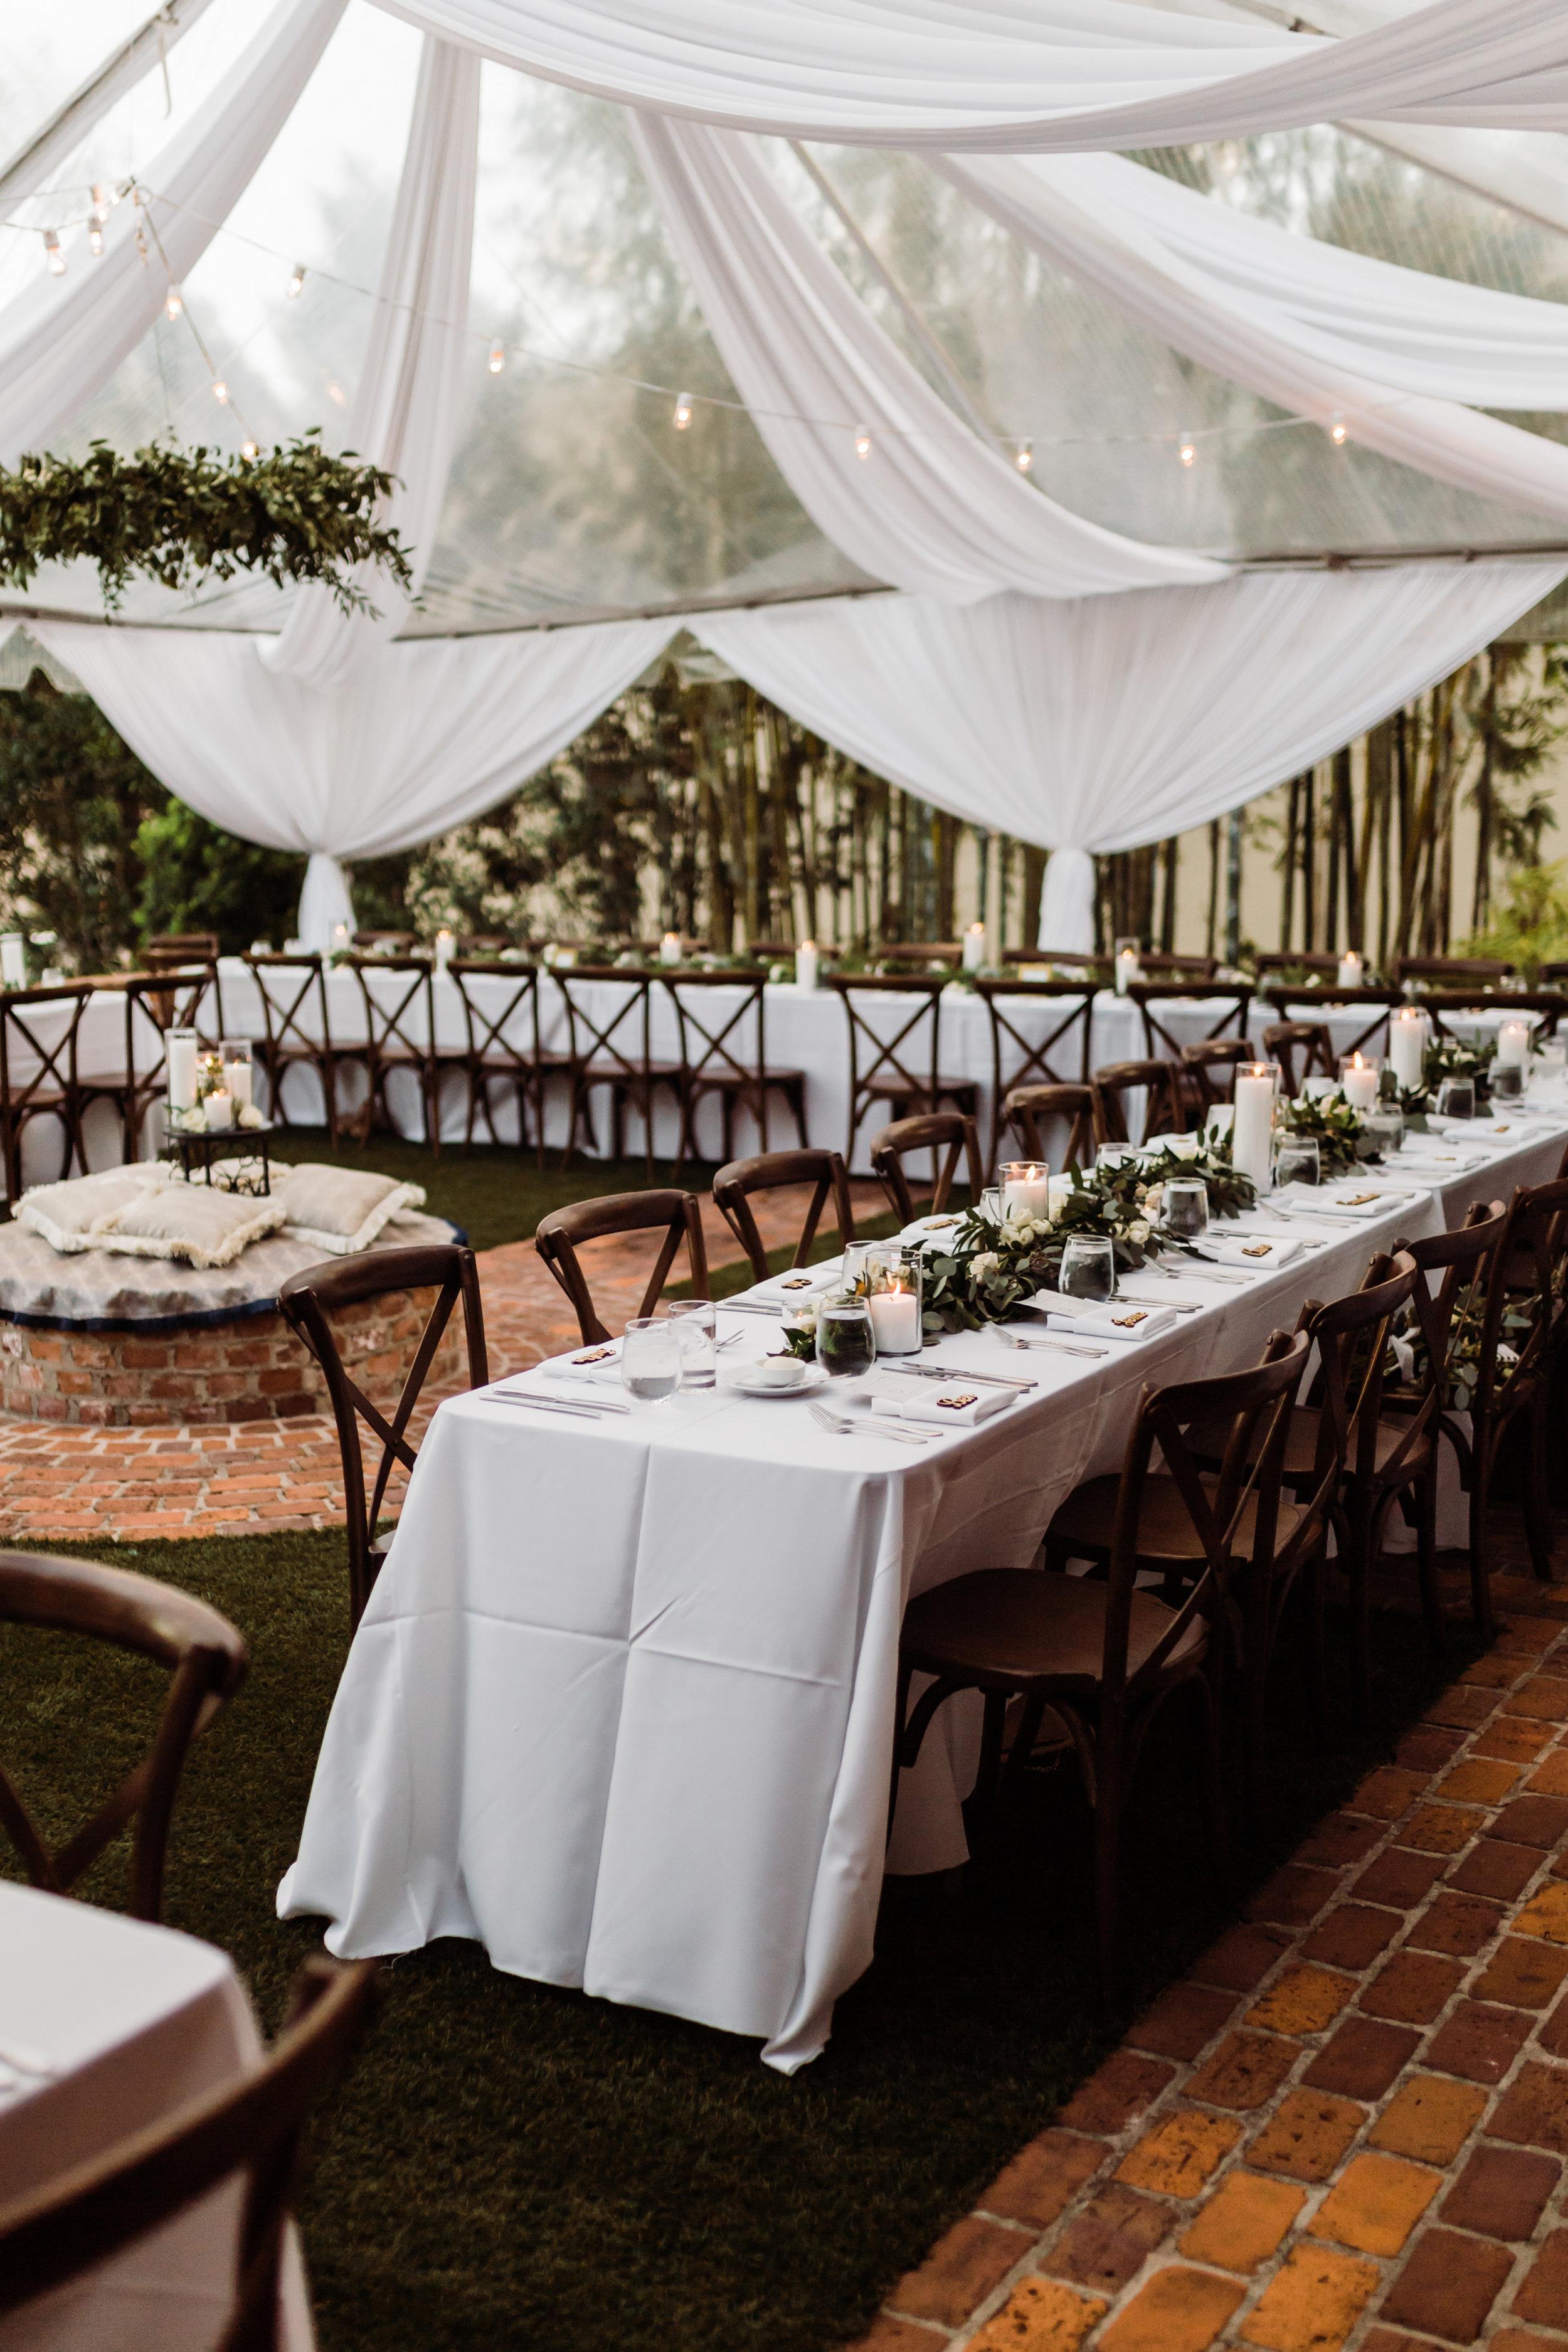 2017.10.15 Steffi and Elliott Simmonds Casa Feliz Wedding (651 of 969).jpg